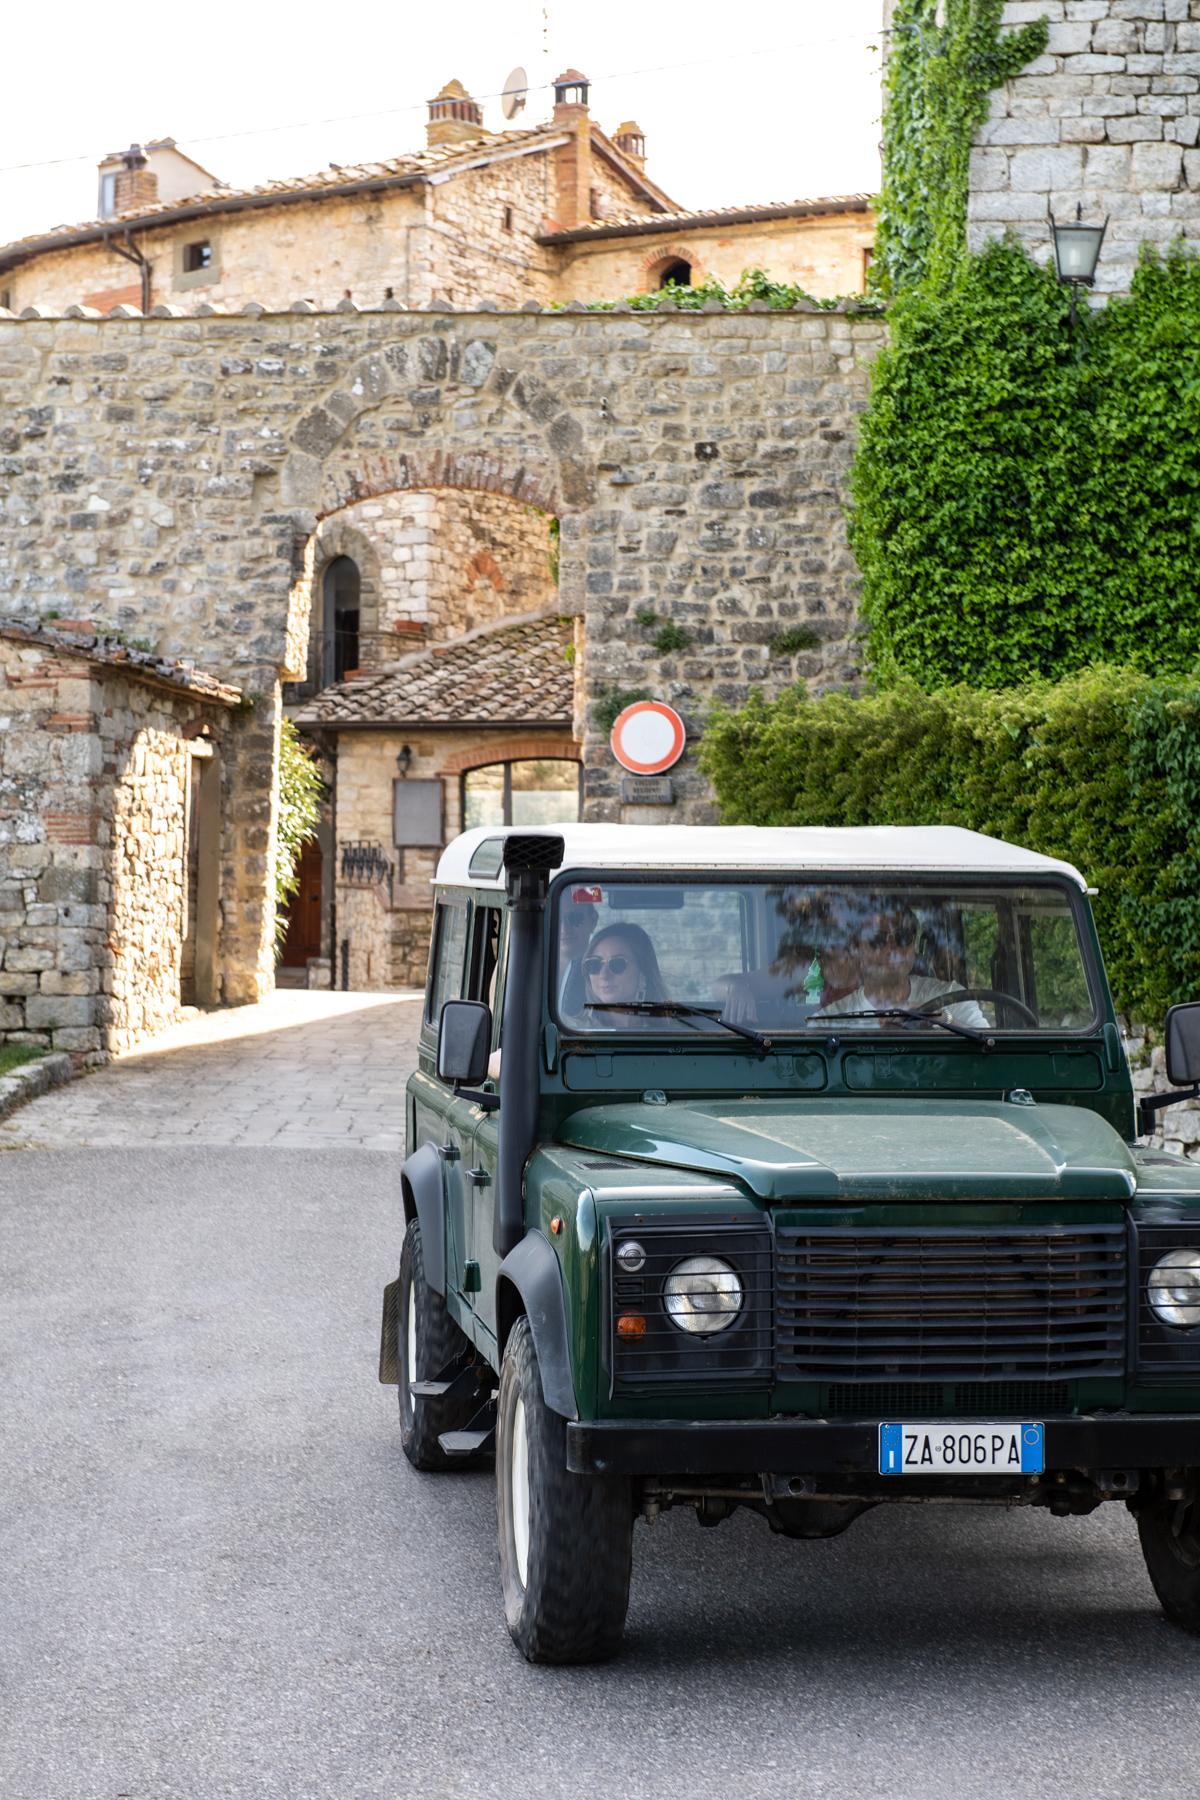 Stacie Flinner x Cuvee Tuscan Farmhouse Tuscany Italy Guide-81.jpg